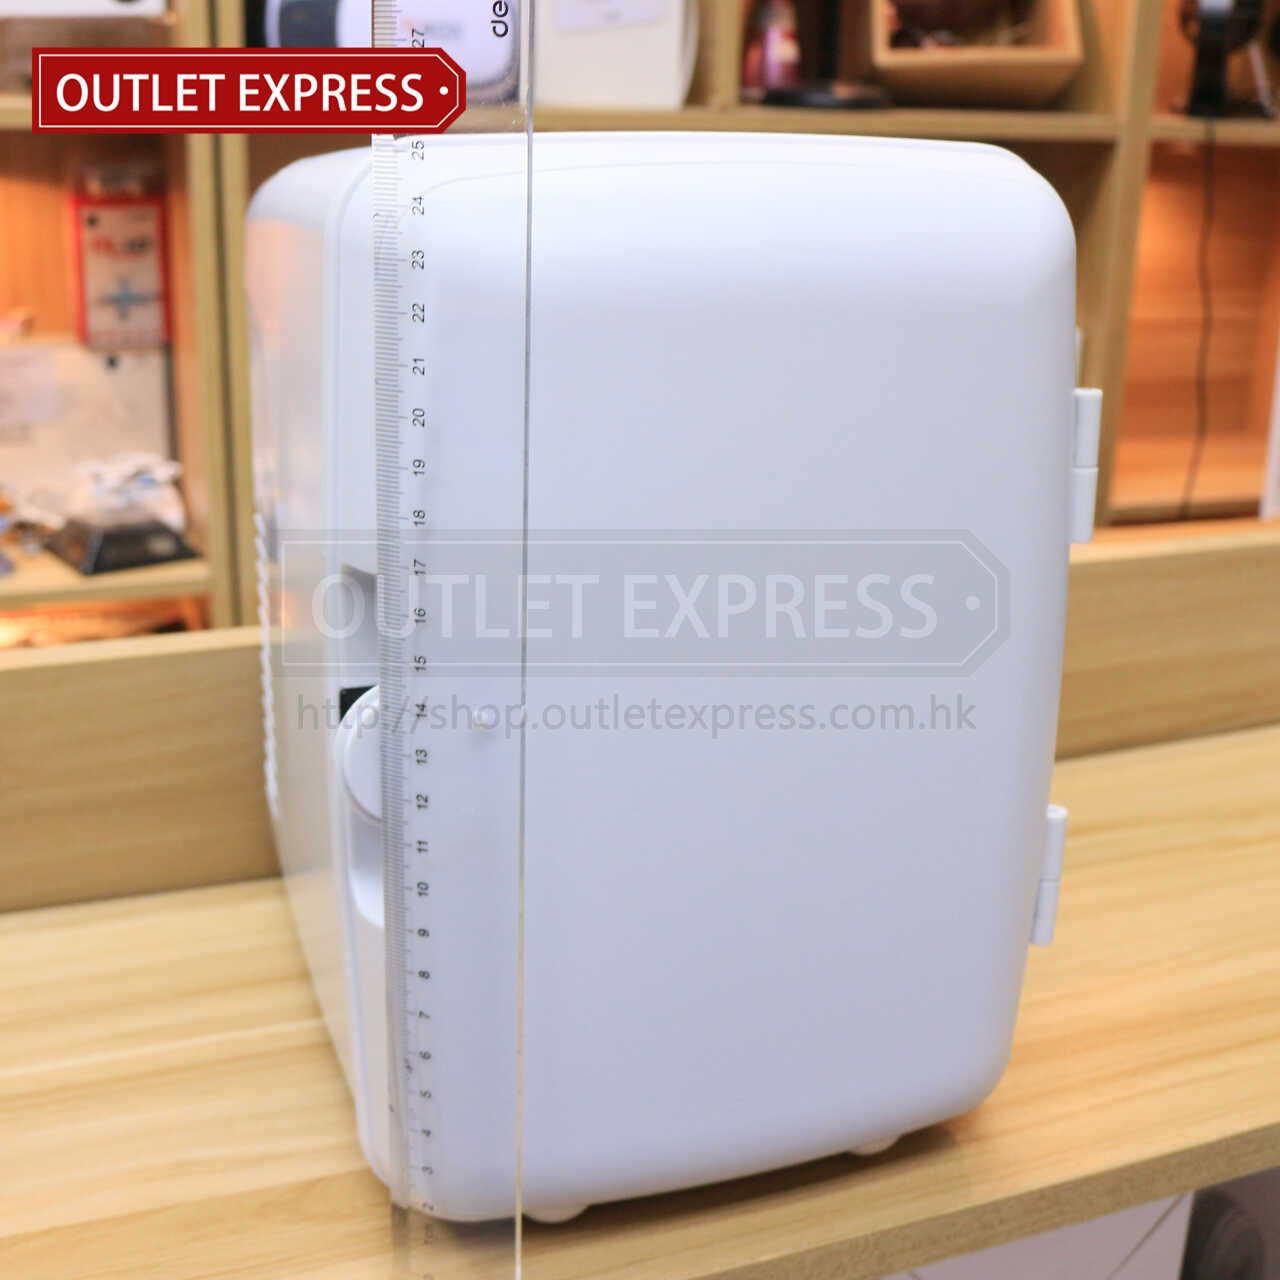 4L 冷暖兩用迷你小雪櫃 | 可車載或家用 高度- Outlet Express HK生活百貨城實拍相片